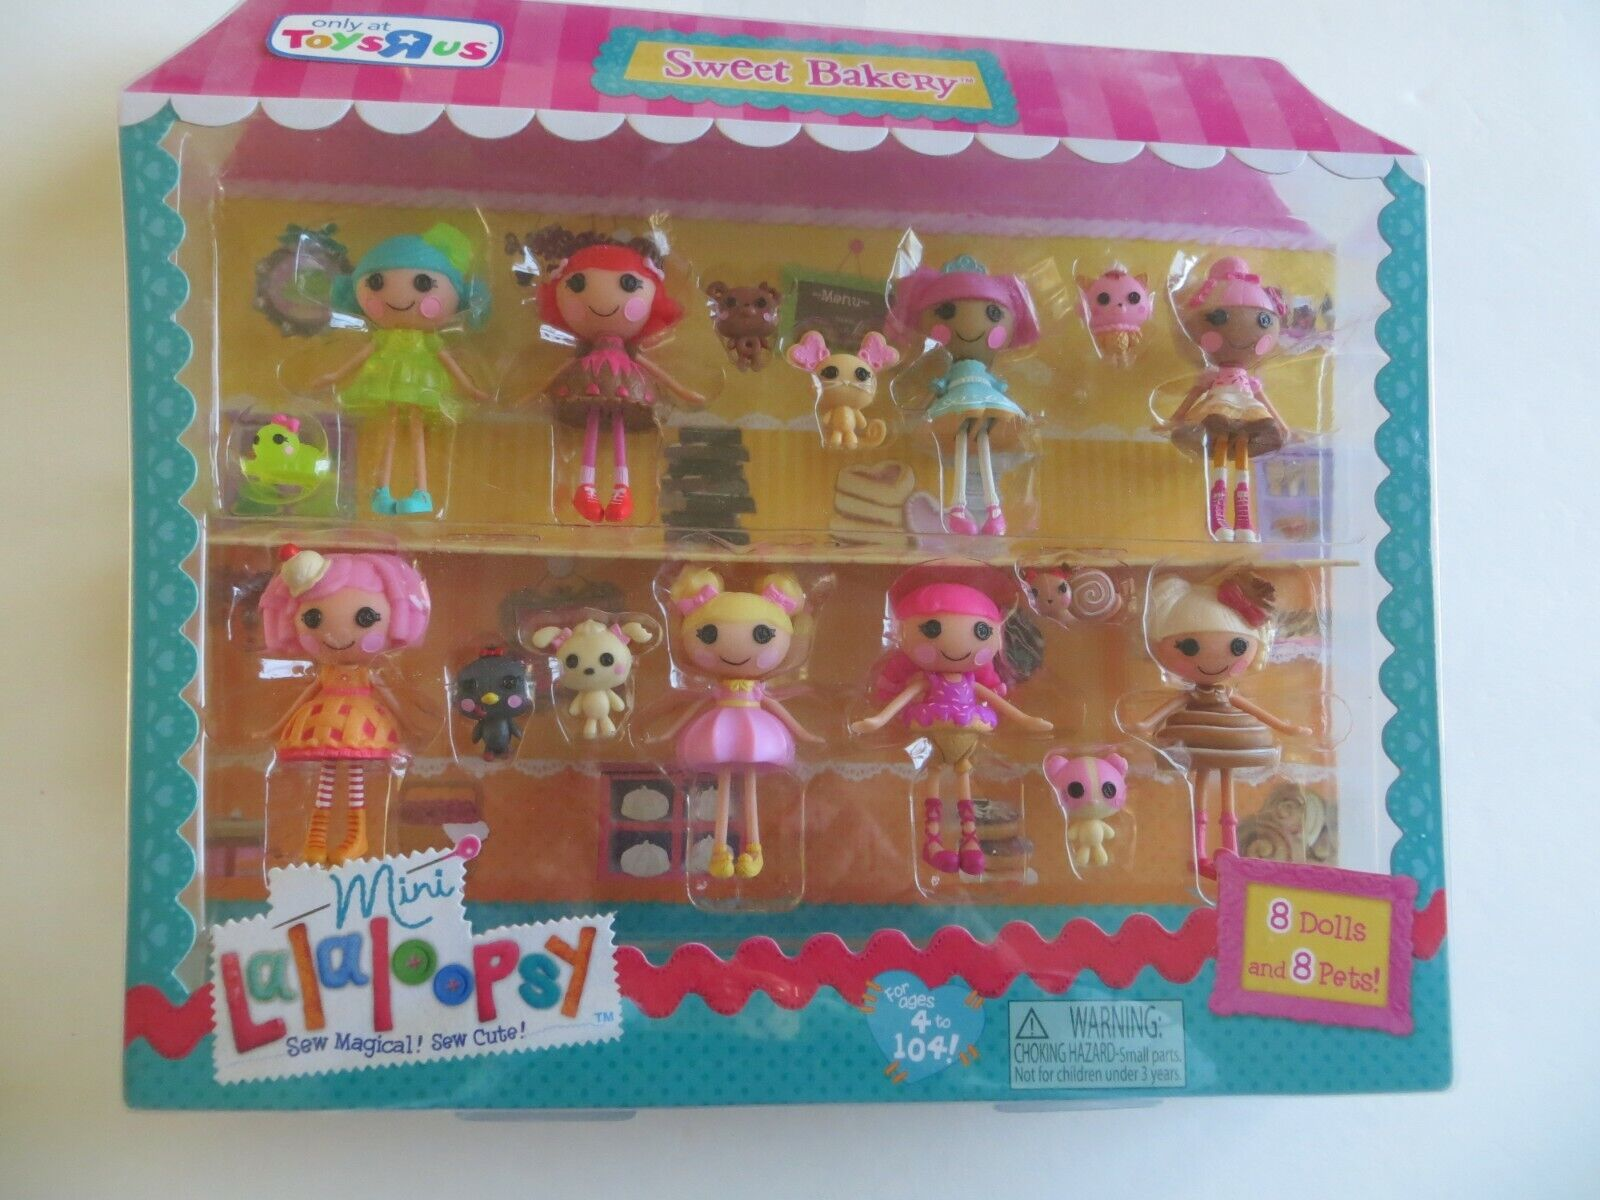 8 Mini Lalaloopsy Dolls Pets Sweet Bakery Toys R Us Exclusive HTF MIP NRFP - $109.99